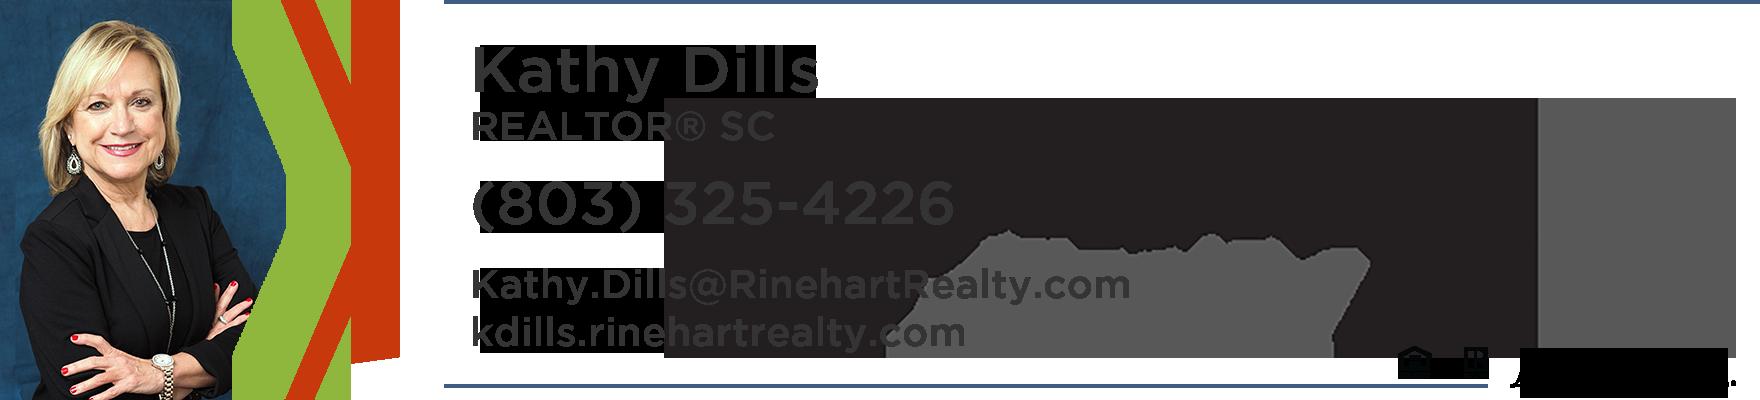 Kathy Dills Realtor SC